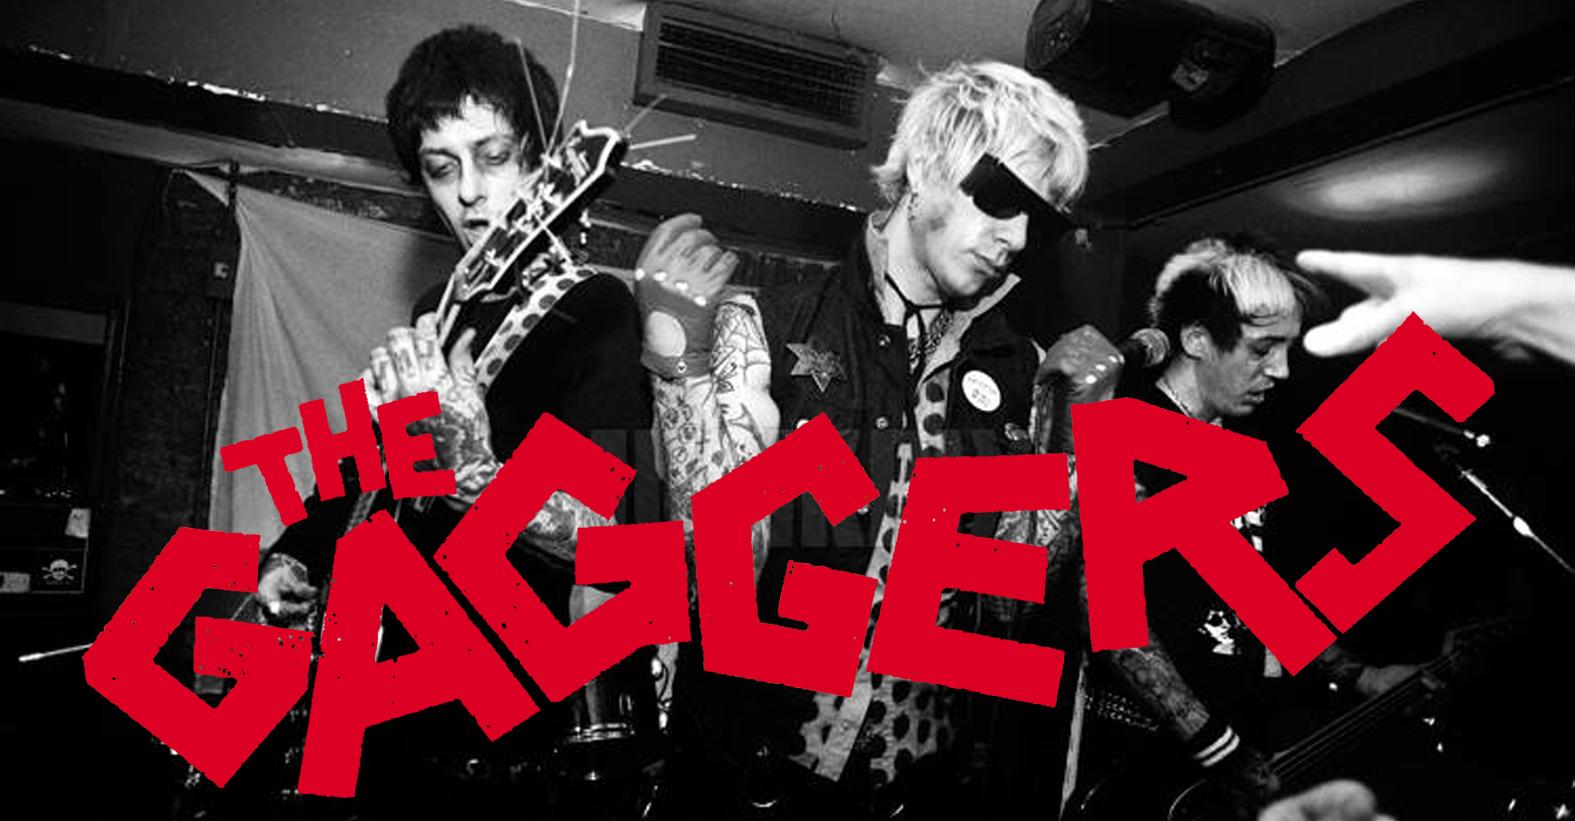 GAGGERS-WebsiteHeader